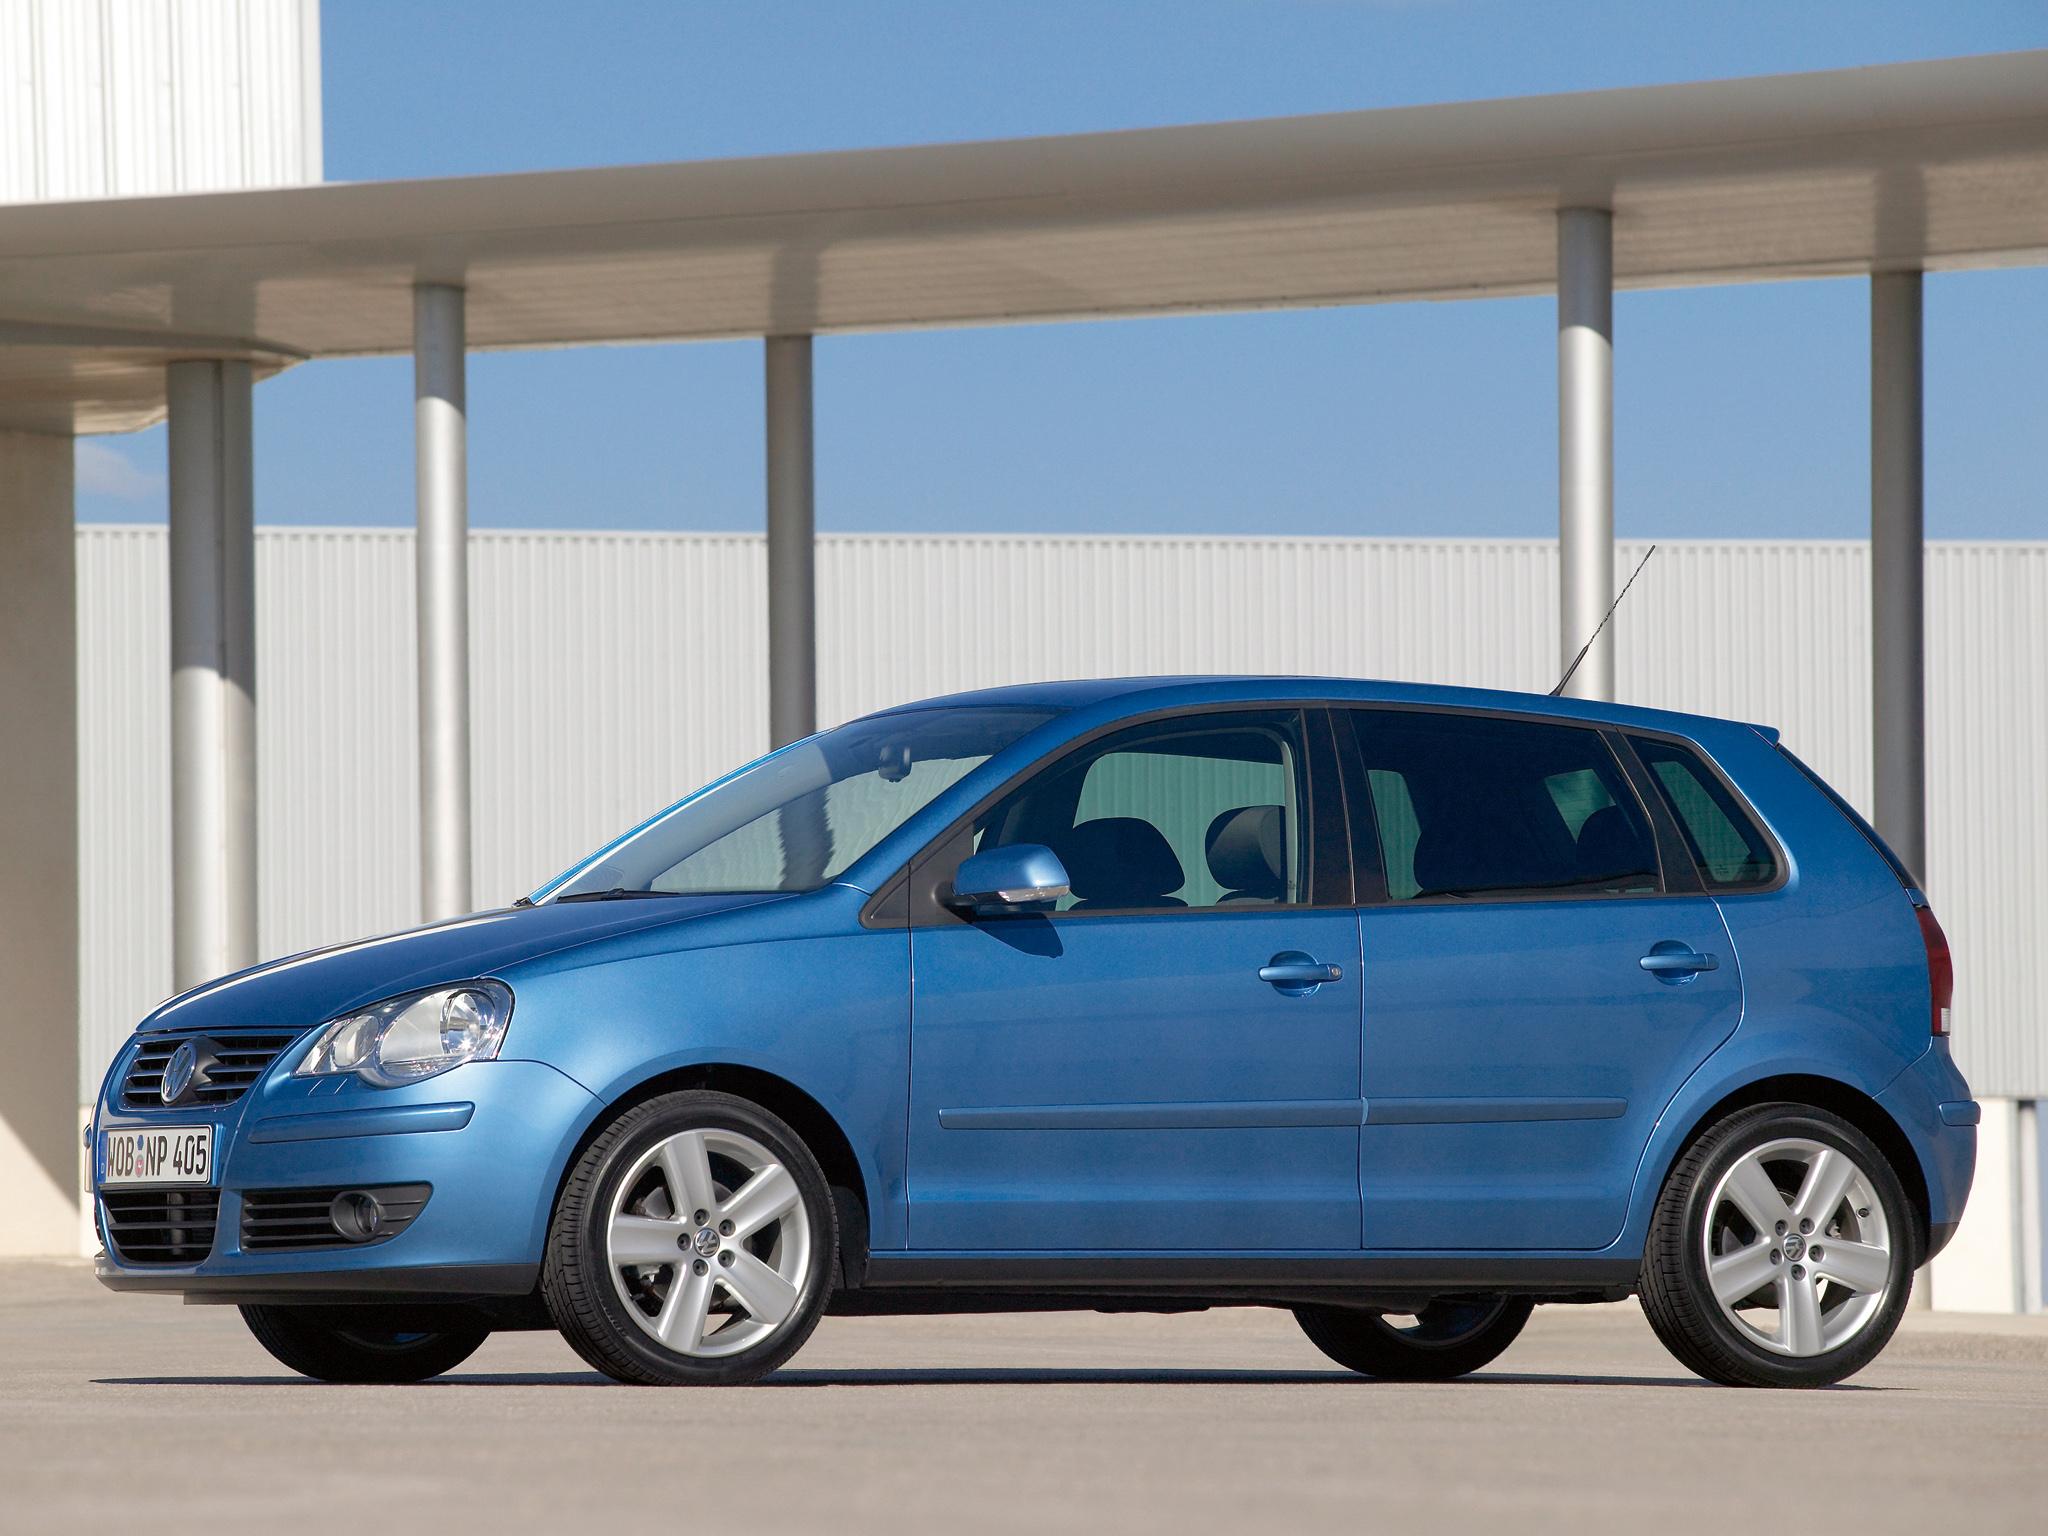 Volkswagen Polo - Dossier kilometervreters - Autovisie.nl